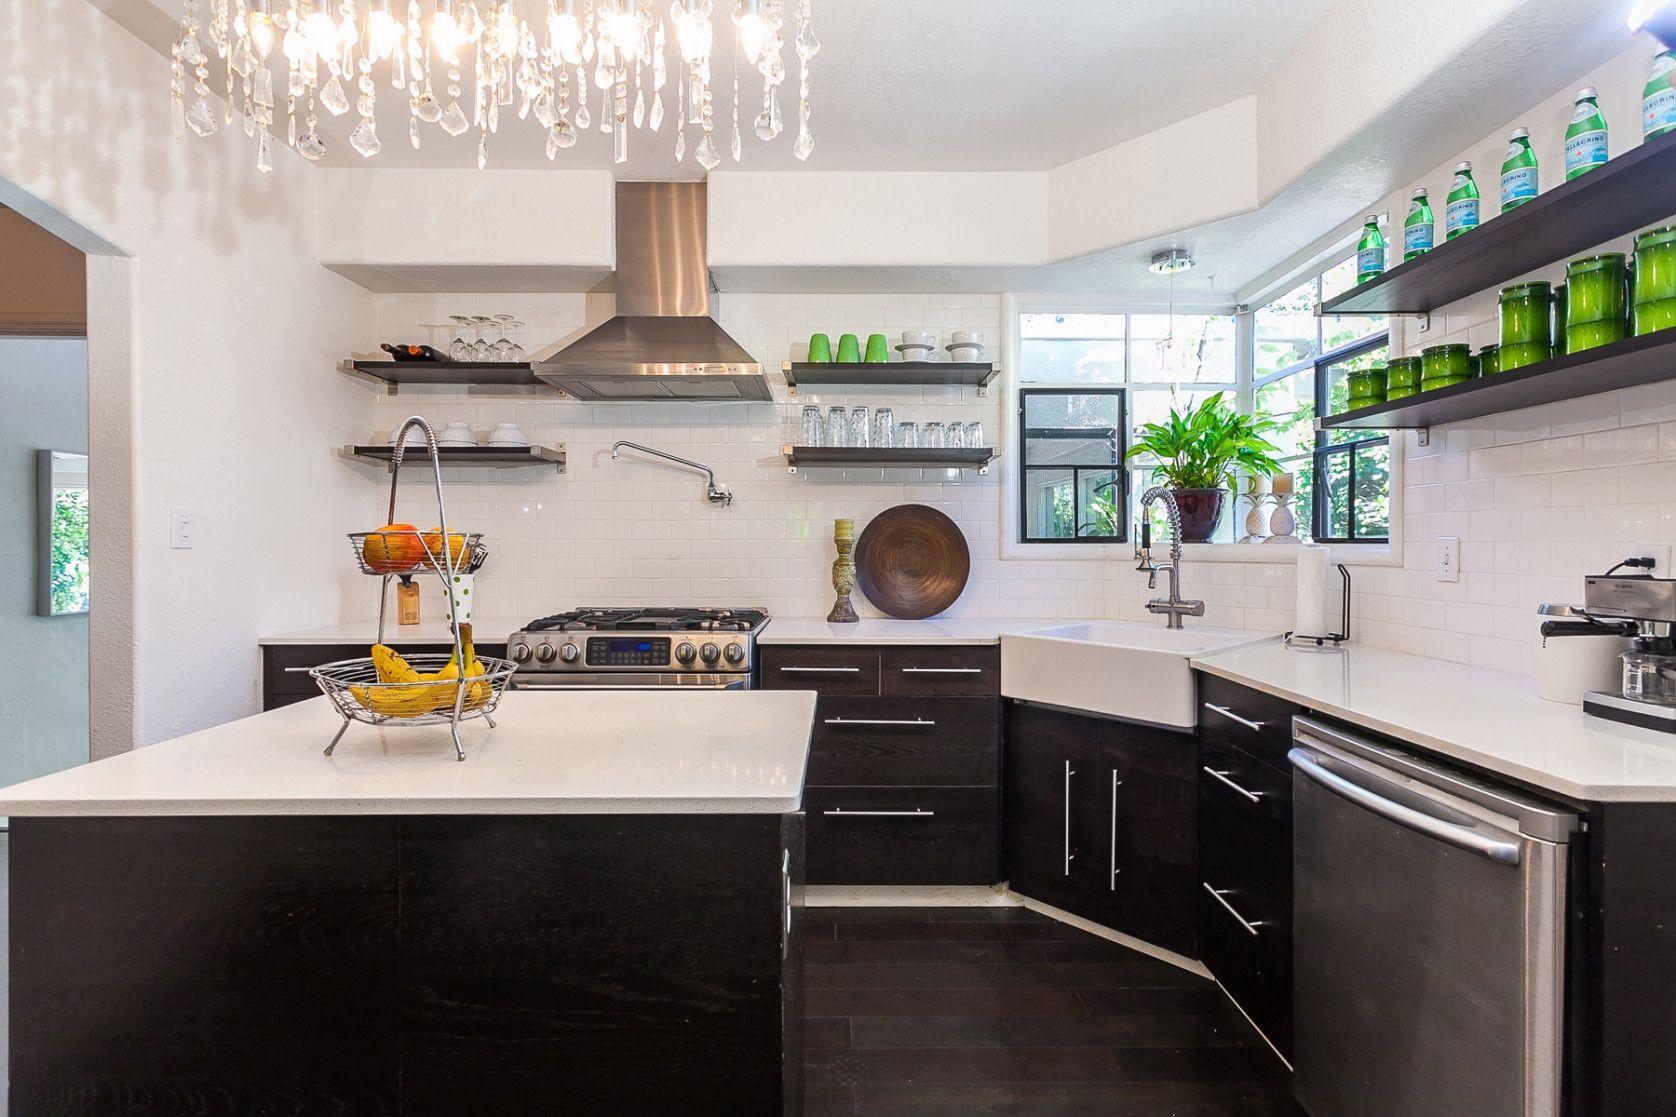 Pin by rahayu12 on interior analogi | Contemporary kitchen ...